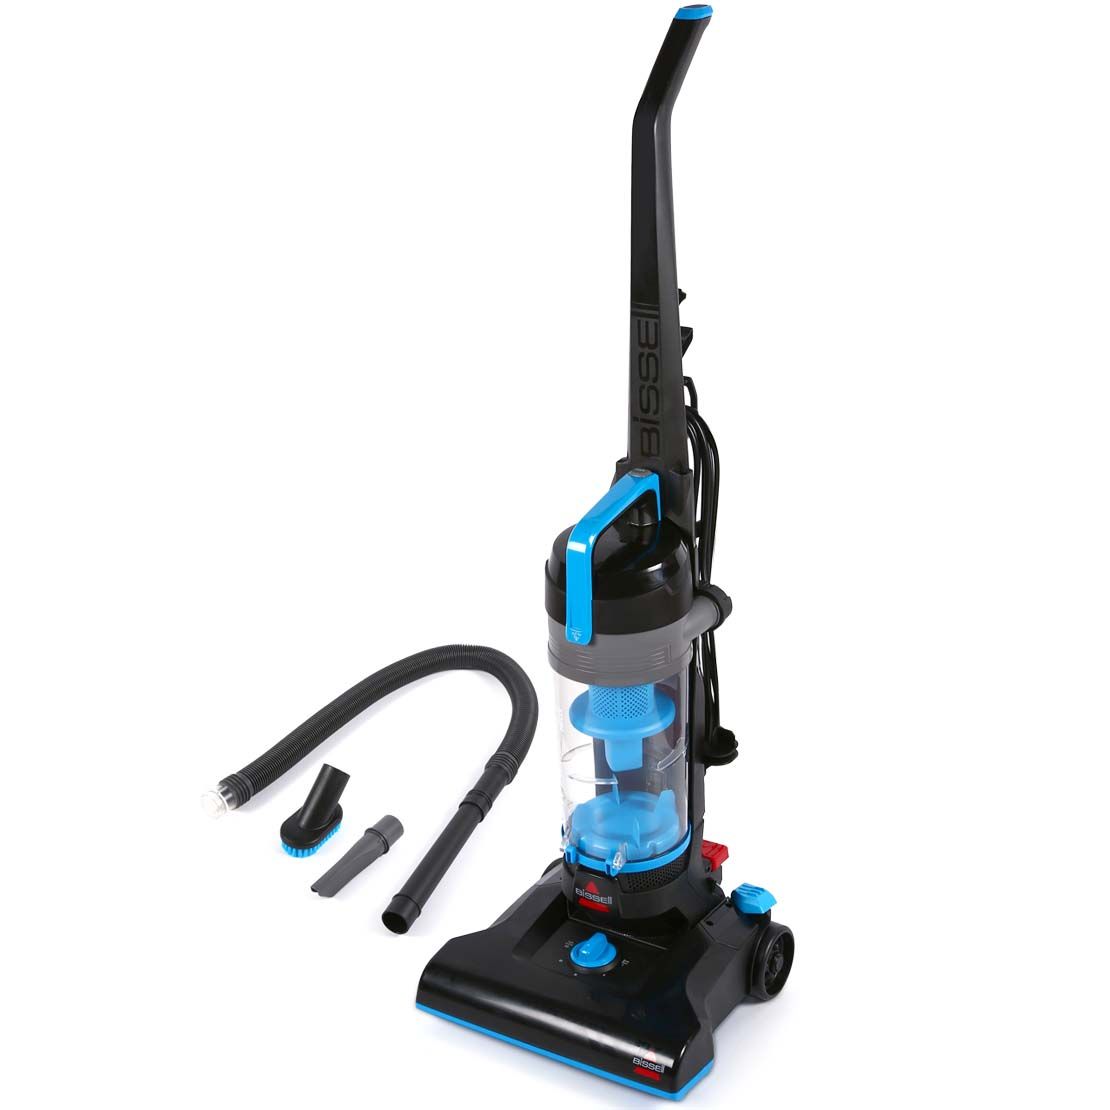 Helix Powerforce 2111E Vacuum Cleaner